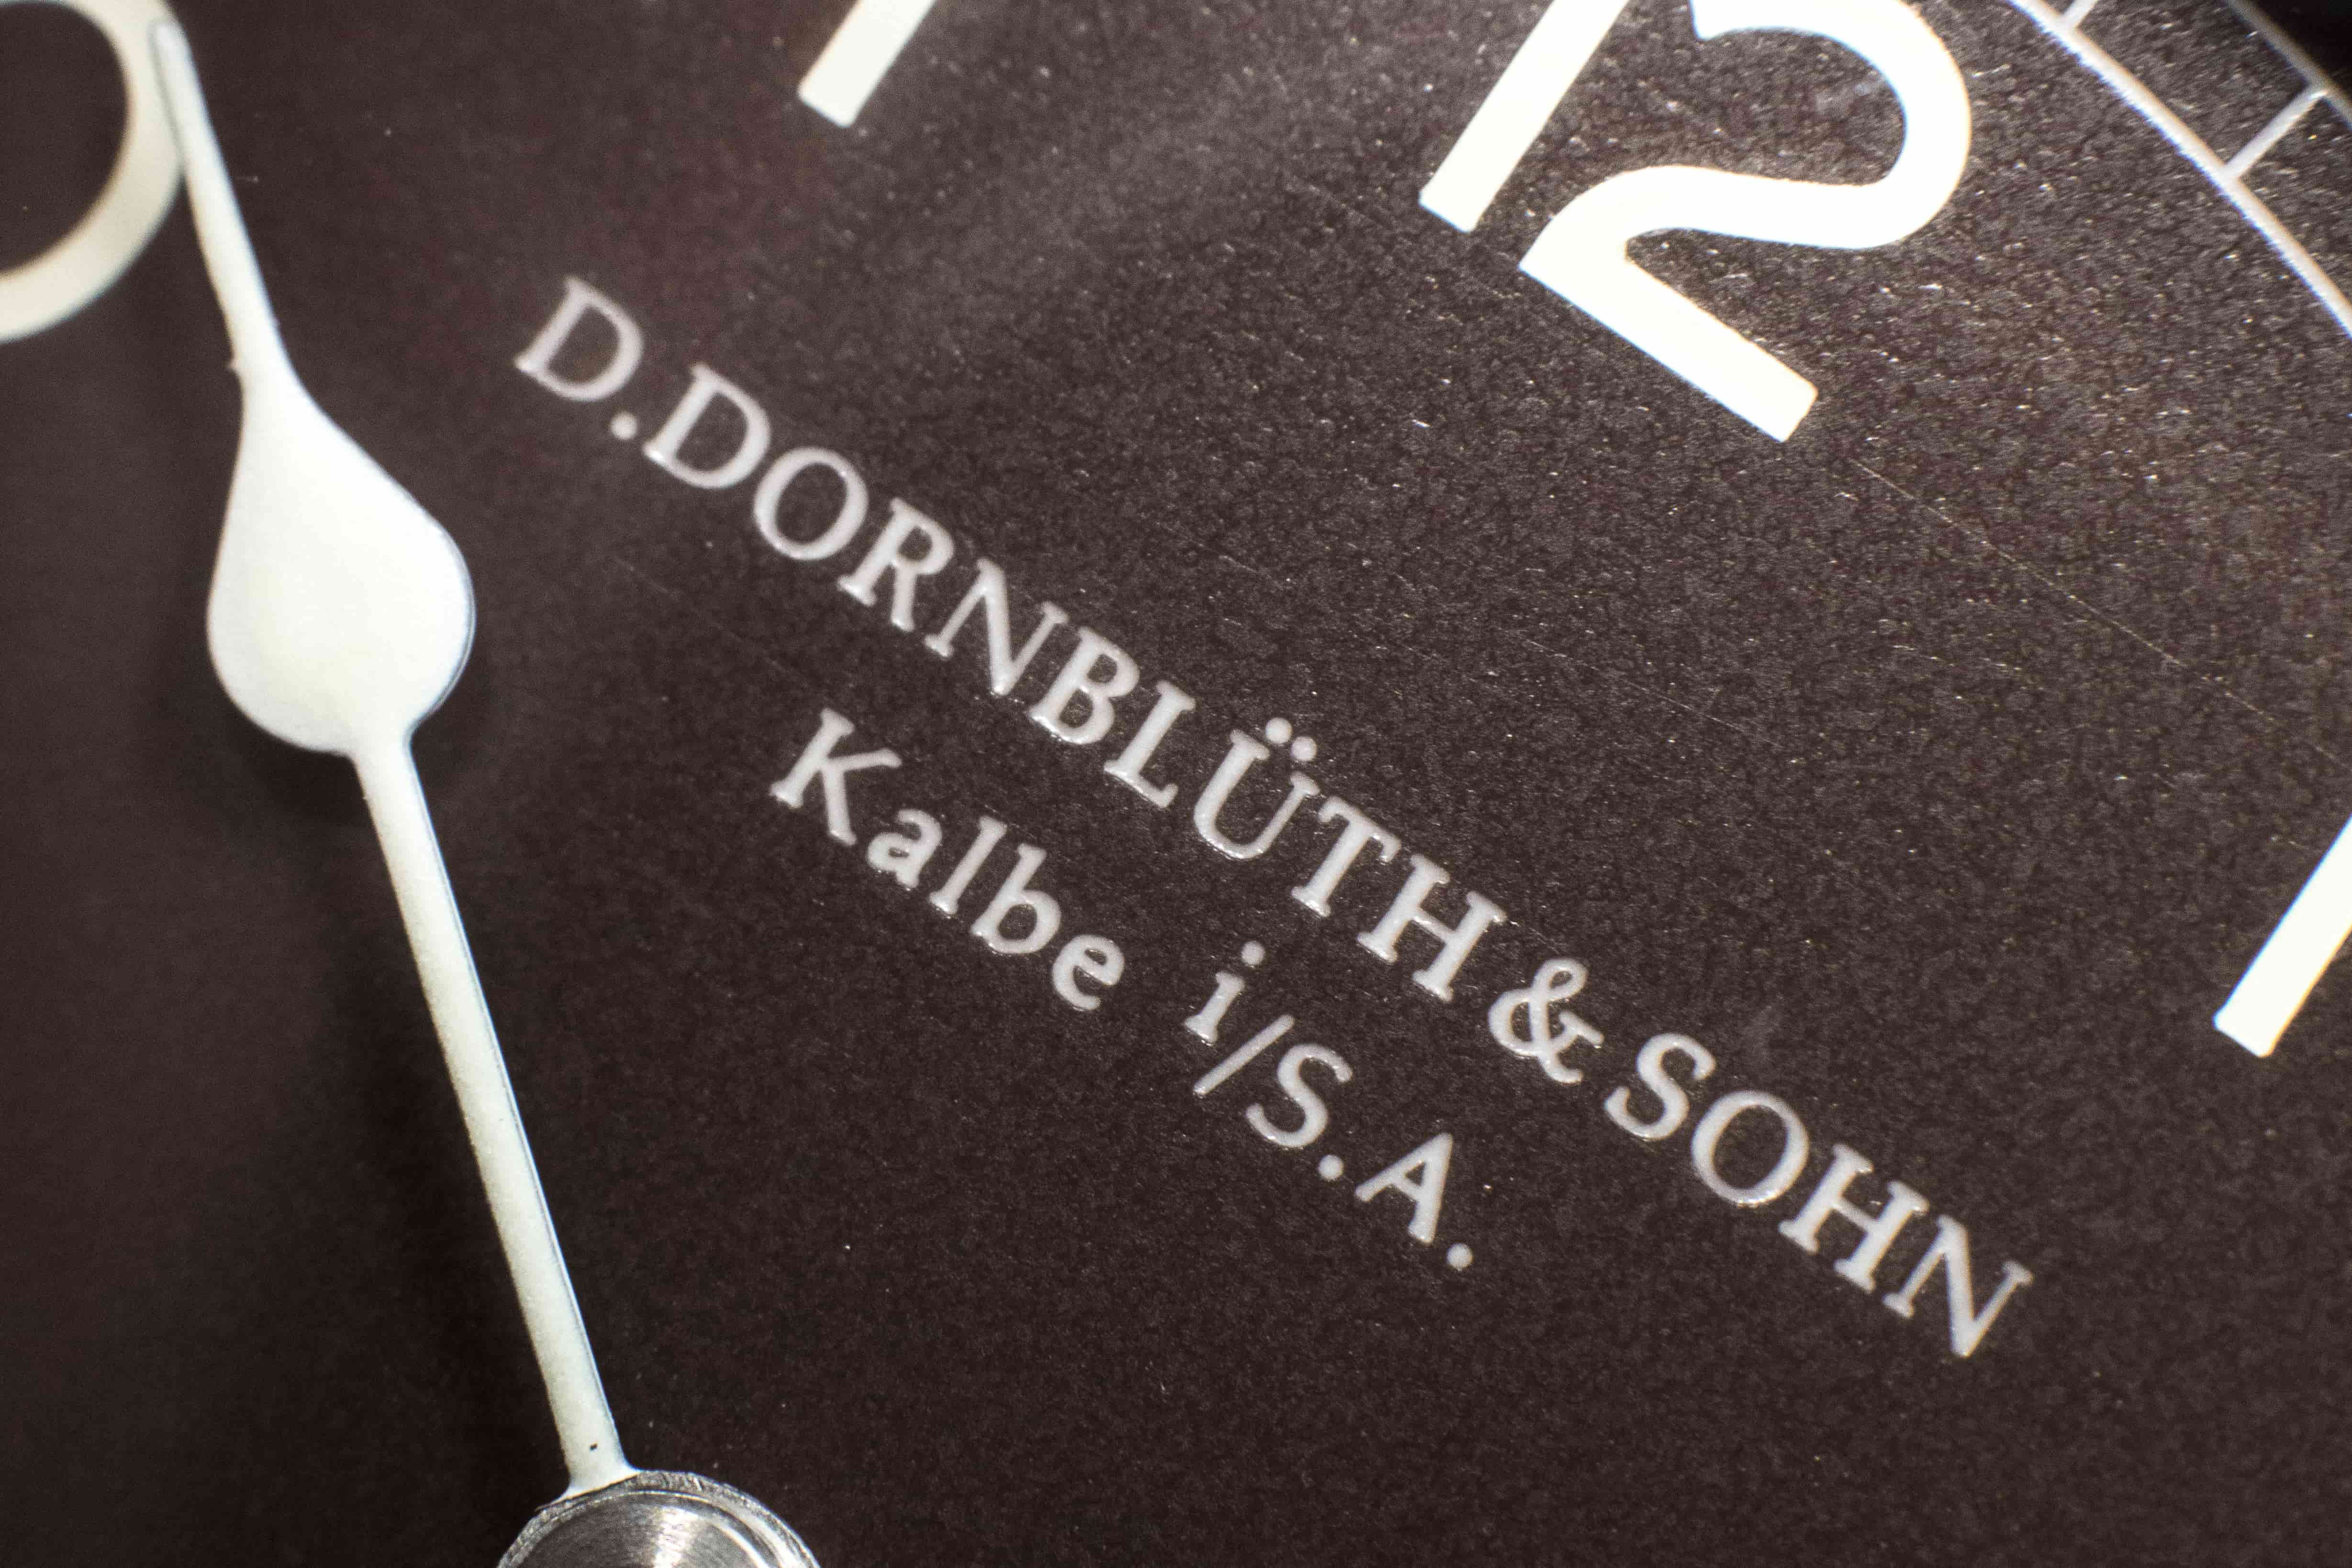 Meet the Master - Dirk Dornblüth